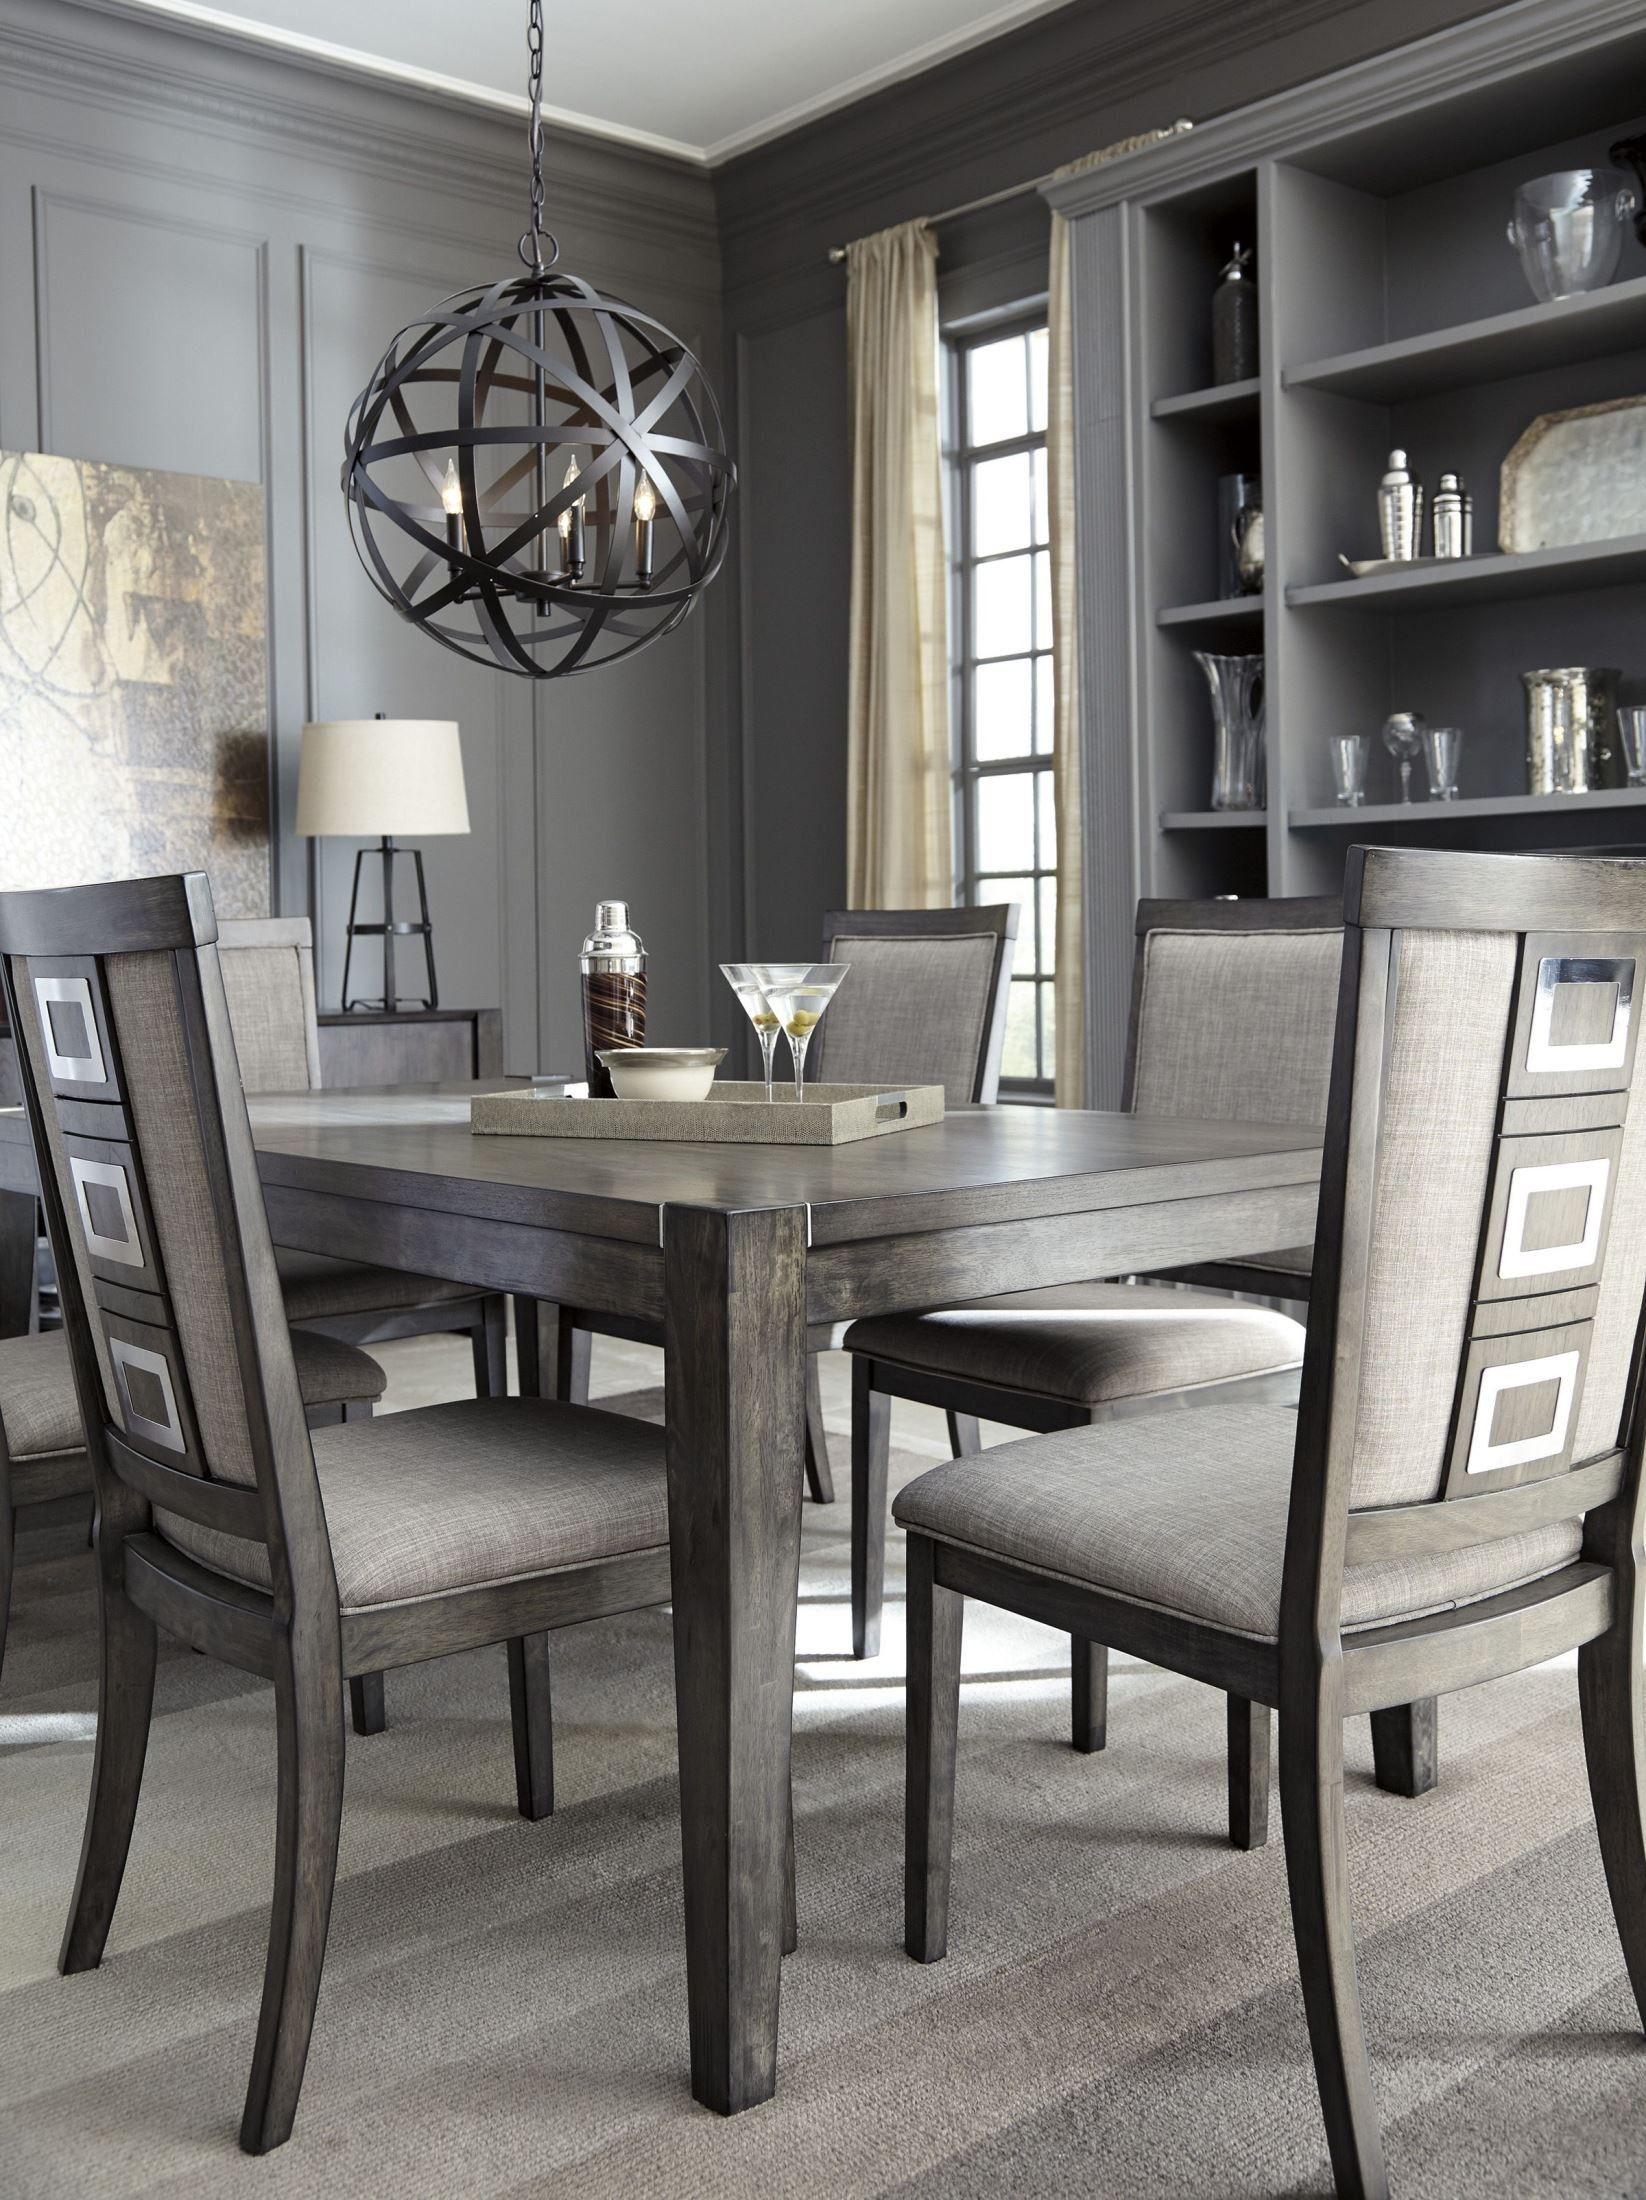 Chadoni Gray Rectangular Extendable Dining Table In 2021 Grey Dining Room Table Grey Dining Tables Grey Dining Room